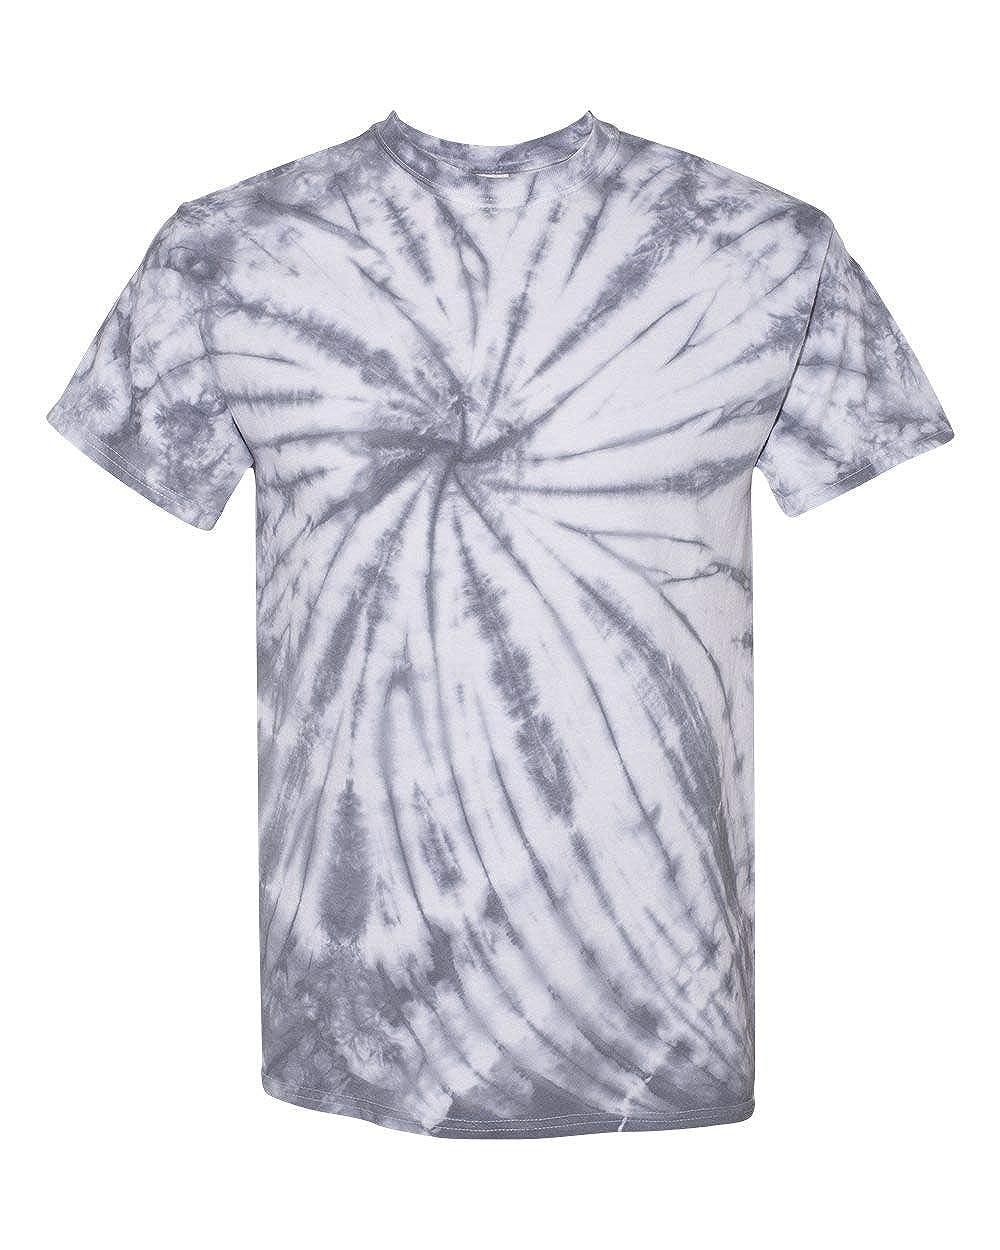 Moms Favorite Dyenomite Contrast Cyclone T-Shirt 200CC